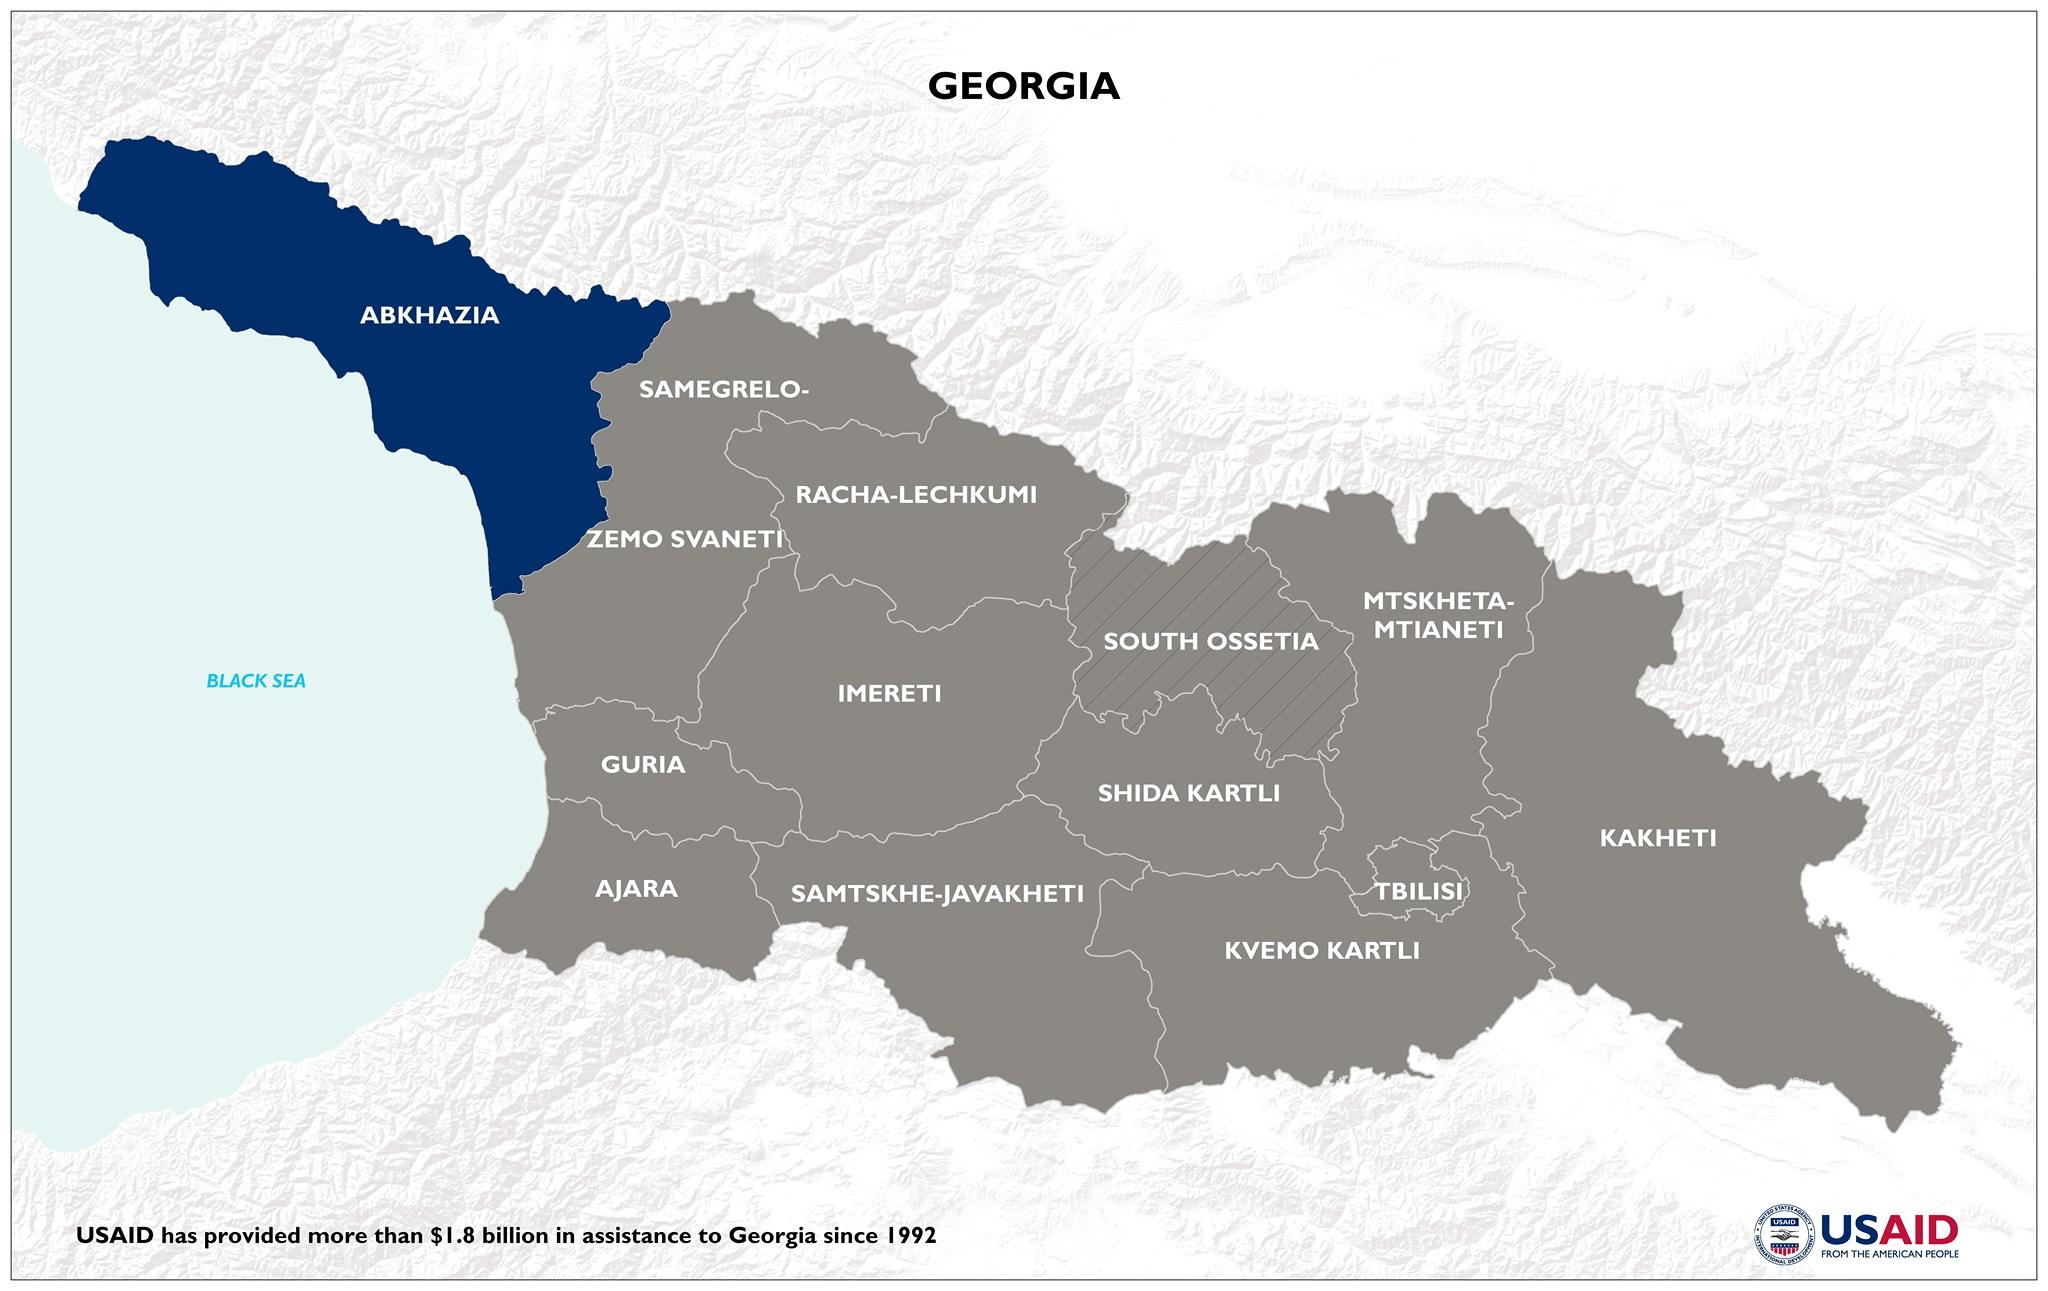 USAID/Georgia representatives visited Georgia's Abkhazia region